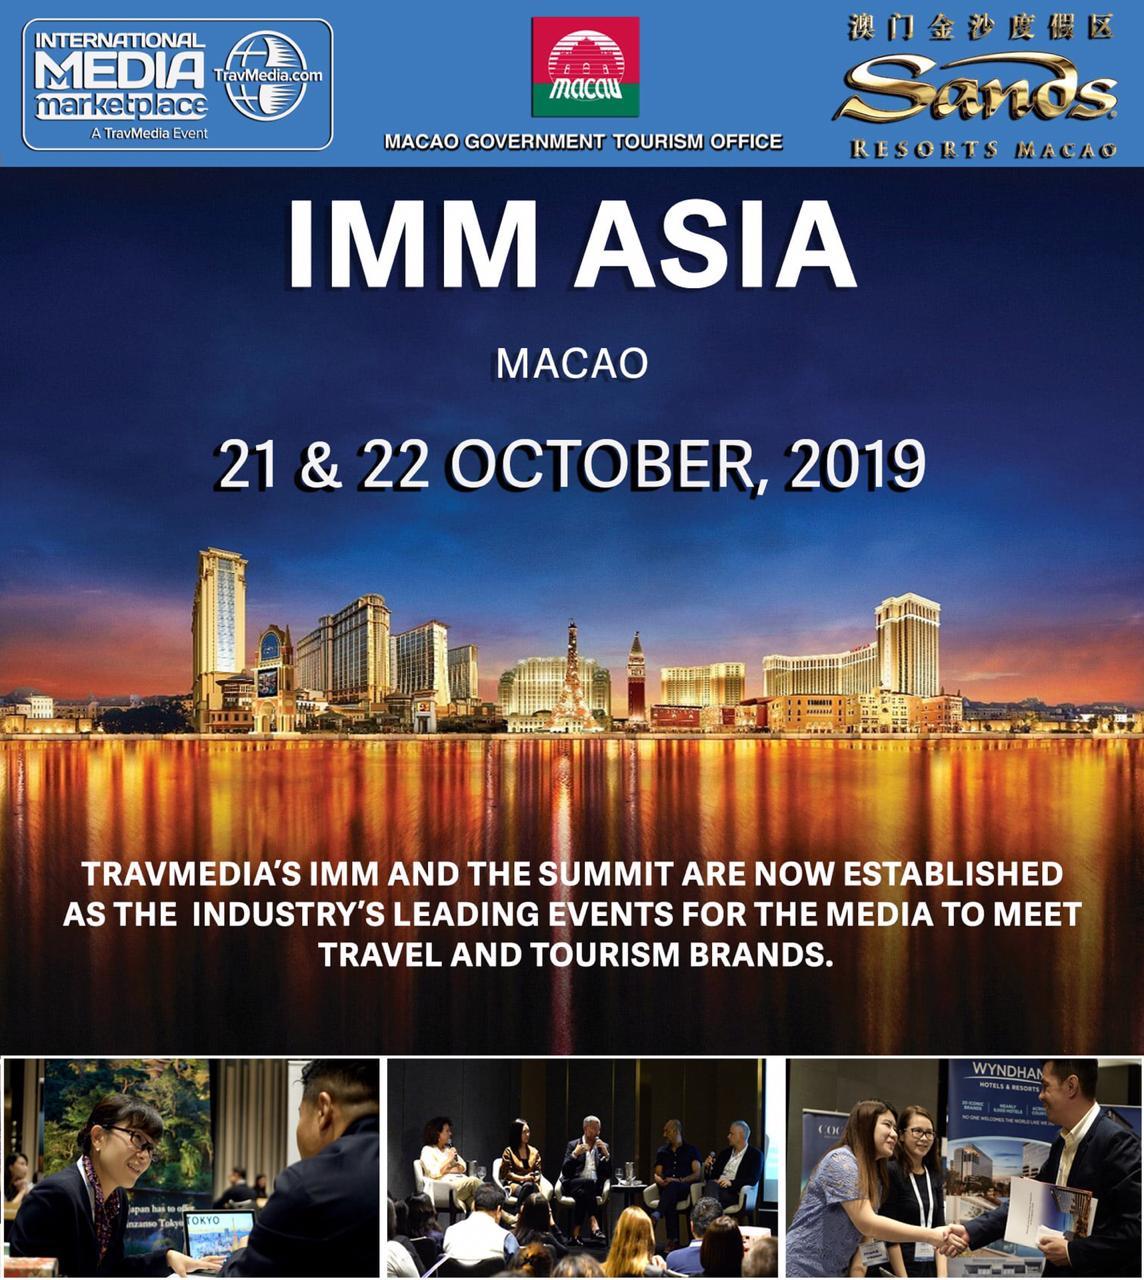 Sri Lanka Tourism partners with several International Organizations at IMM Asia 2019